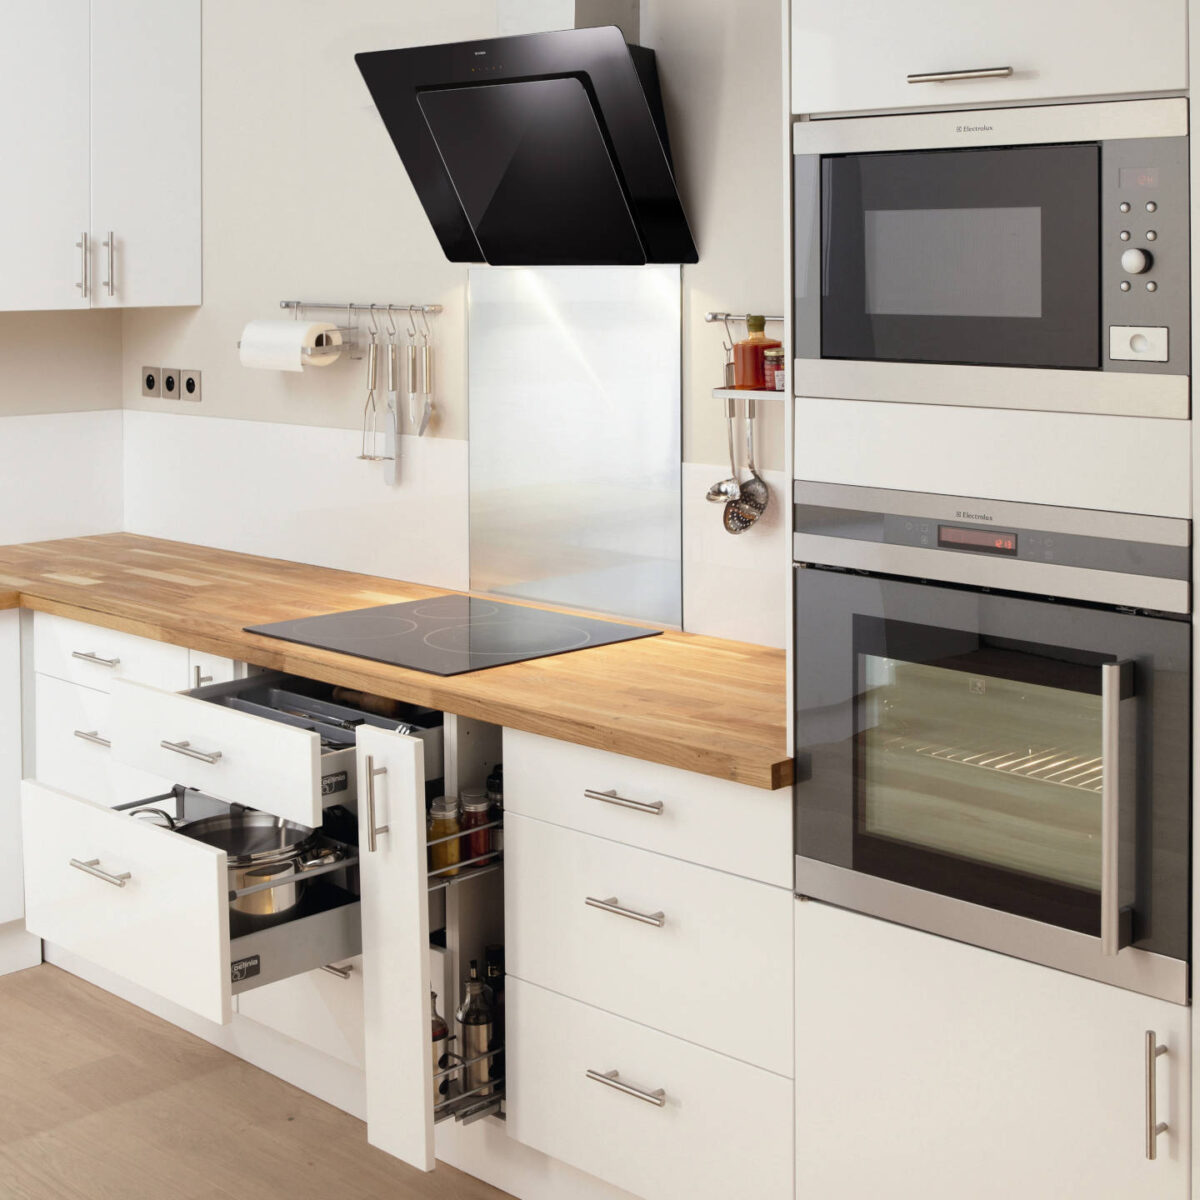 cucina-scandinava-piccola-idee-2